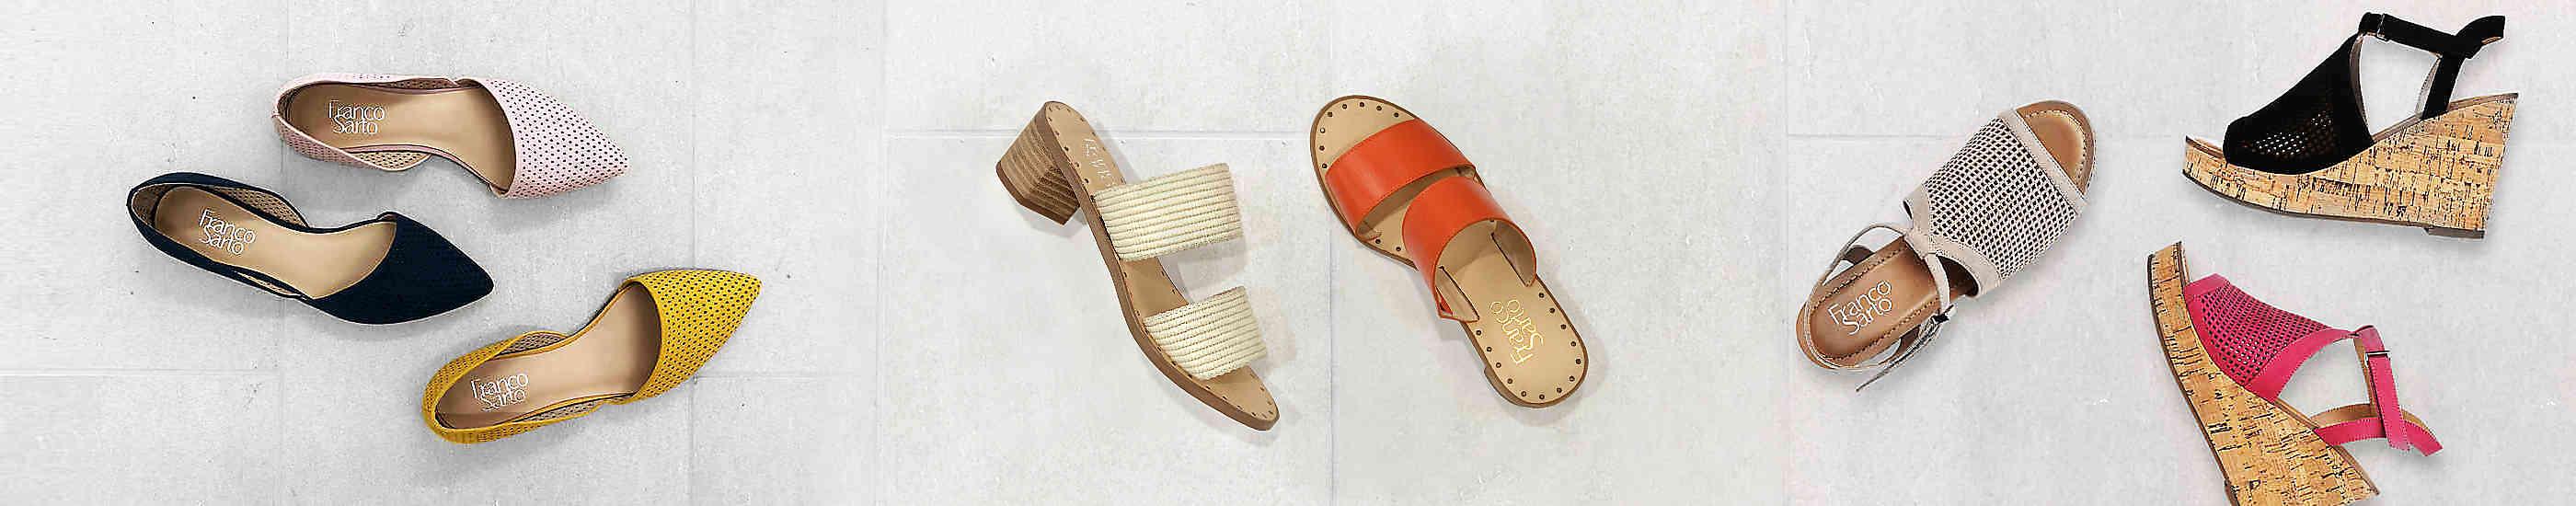 Franco Bootsamp; Ankle FlatsDsw Sarto BootsSandals vymOn0N8w